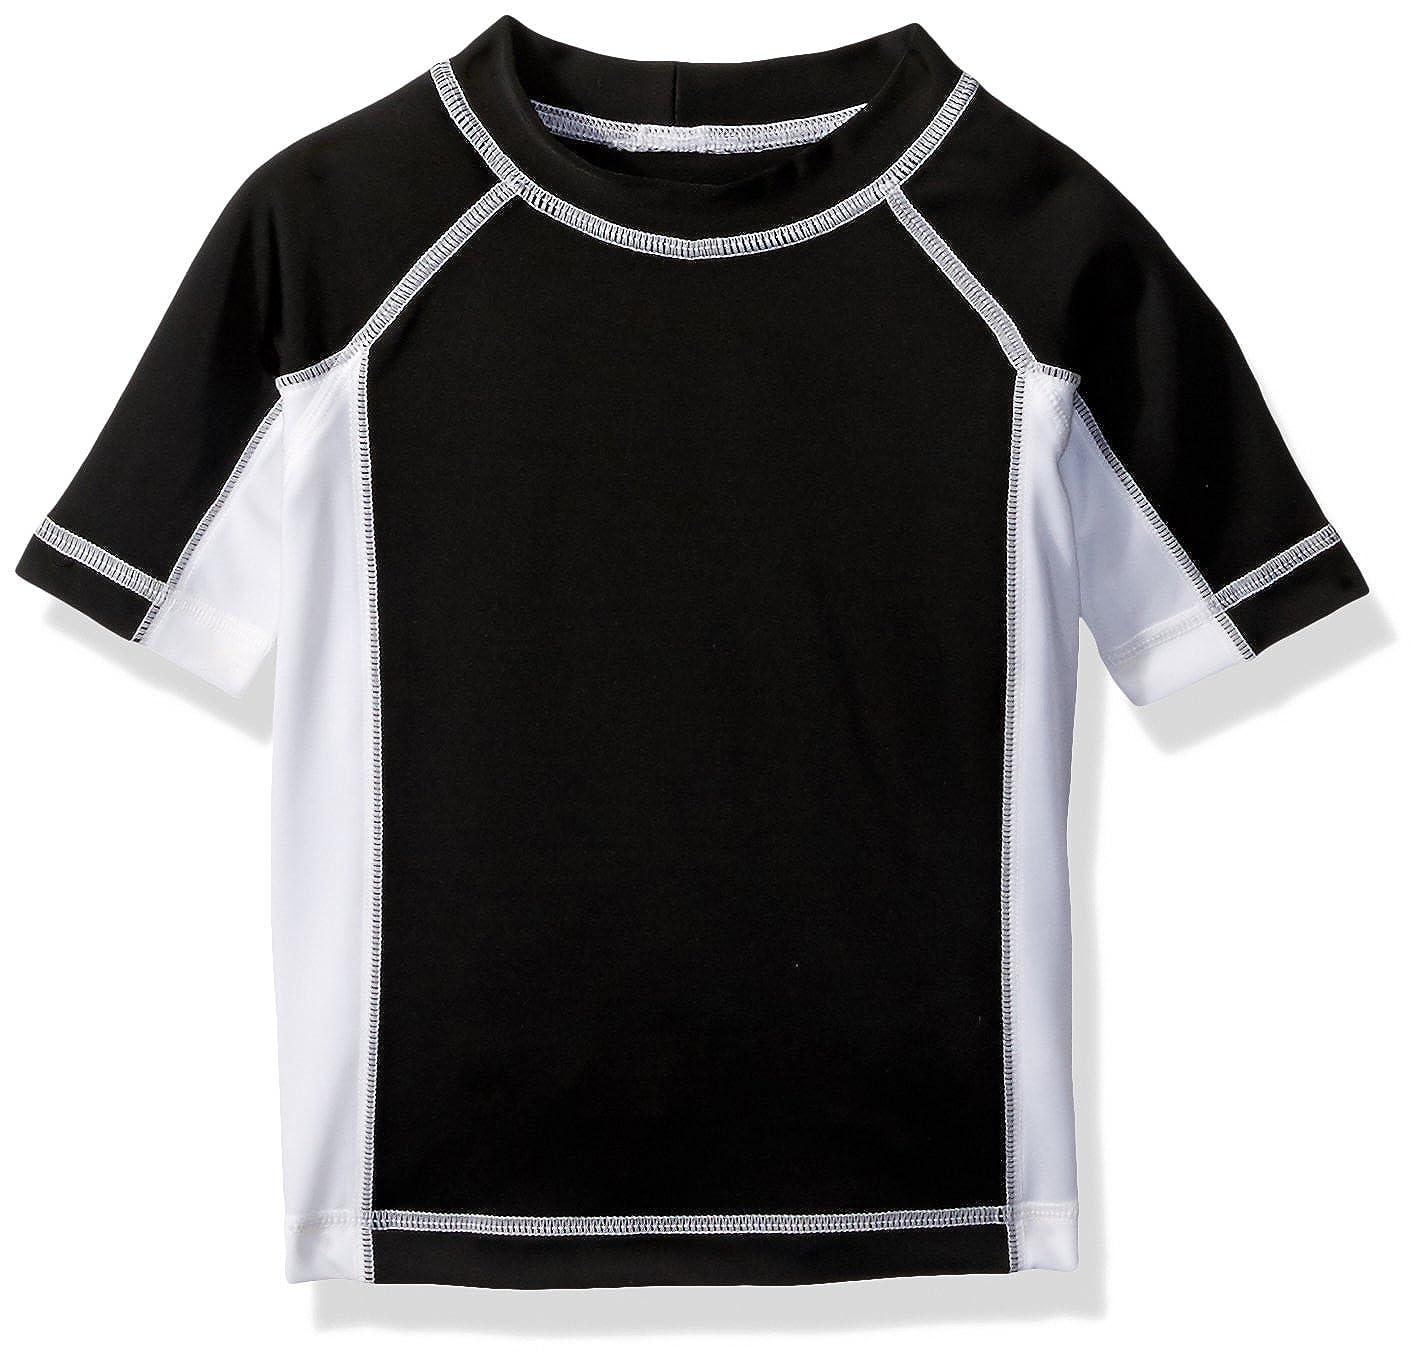 Gymboree Baby Boys' Toddler Blk White Rshgaurd 140165092